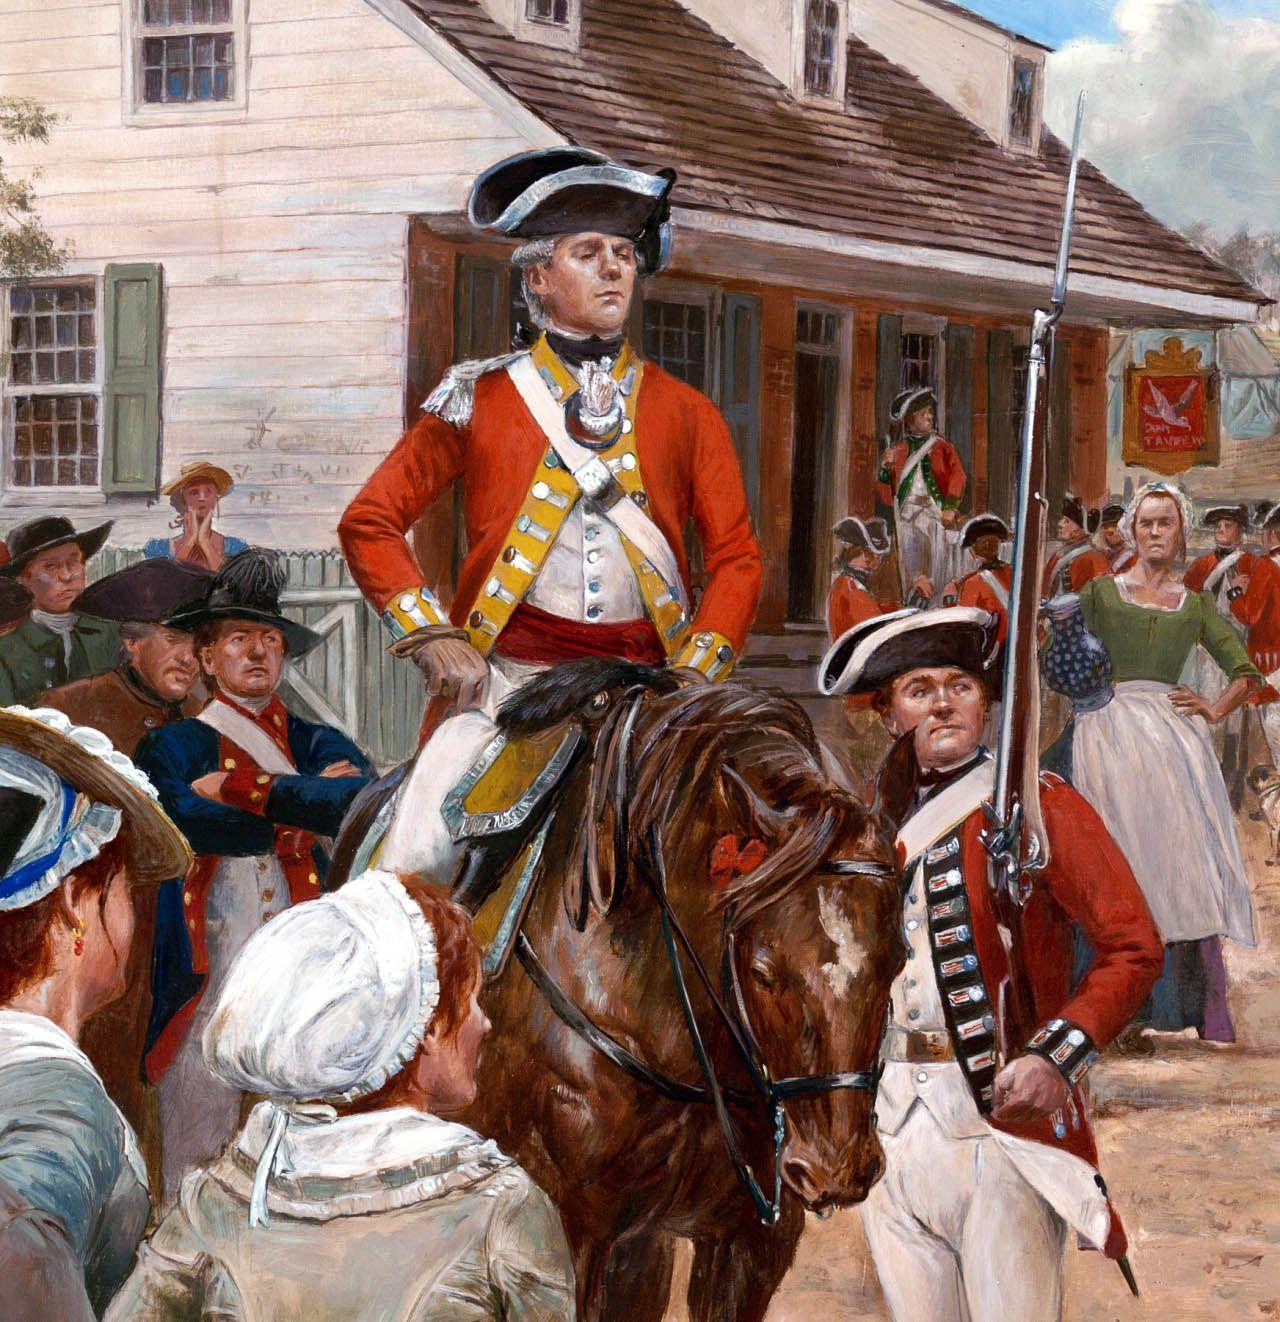 British redcoats in Boston